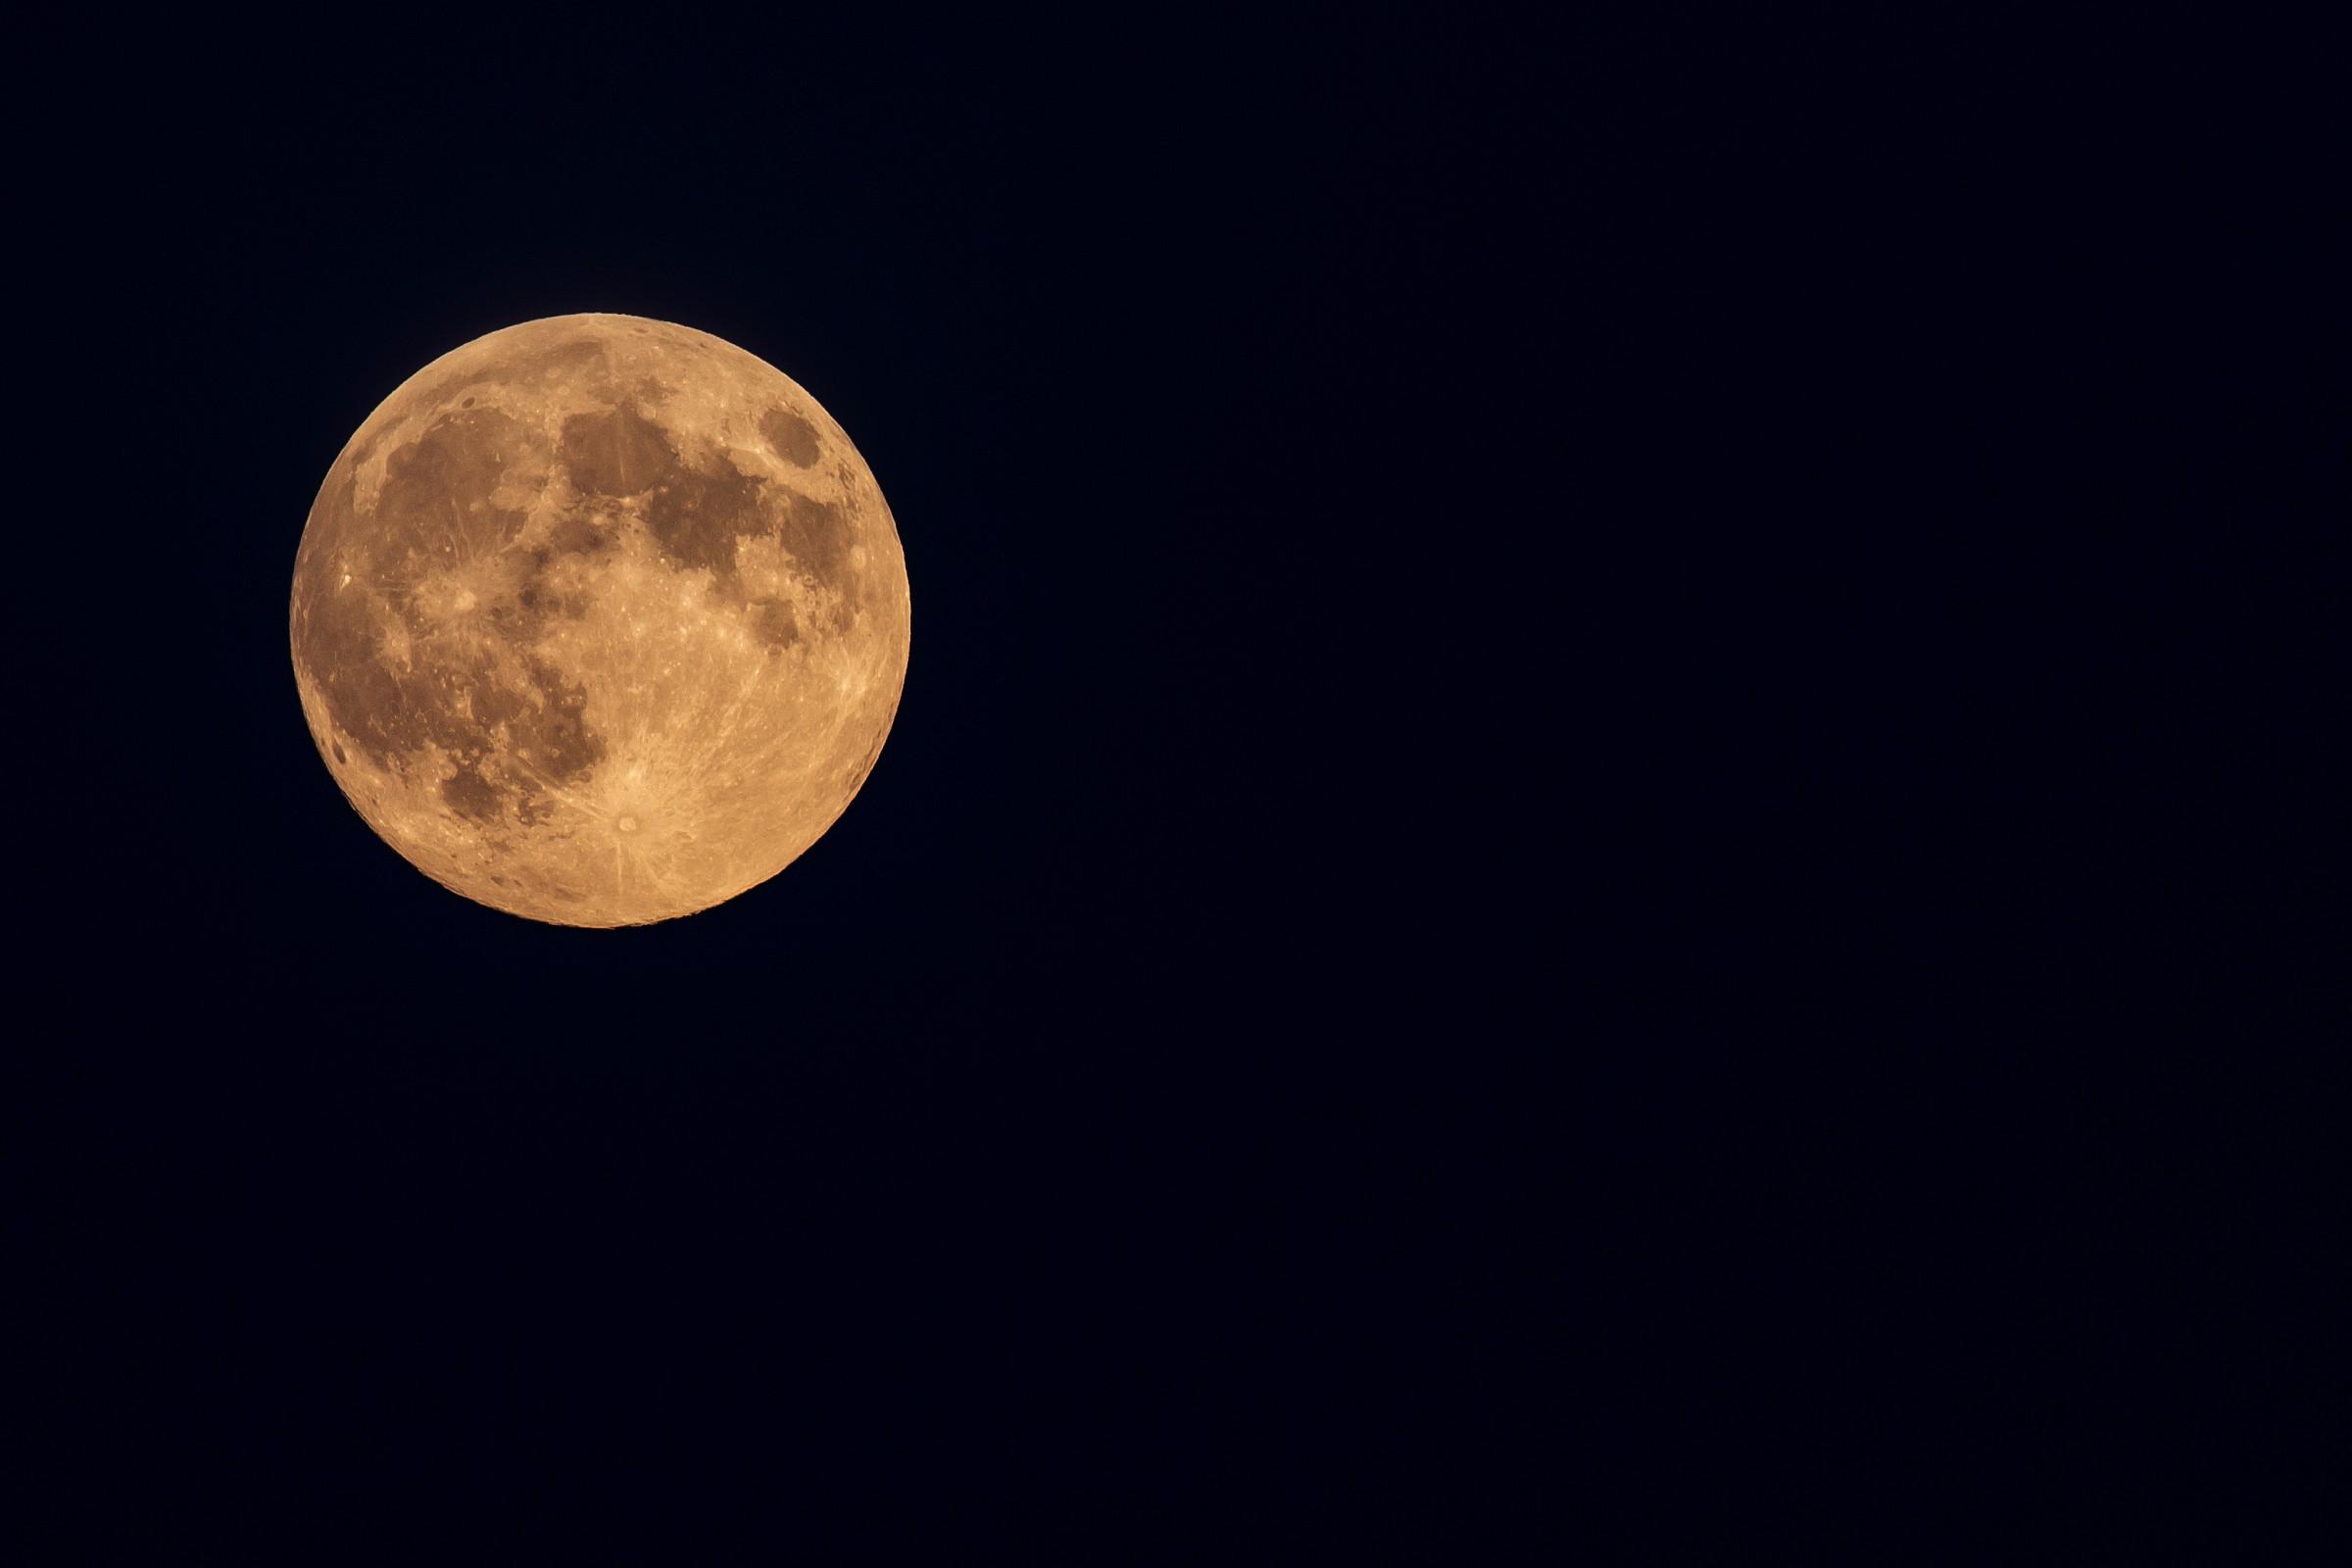 luna arancio...